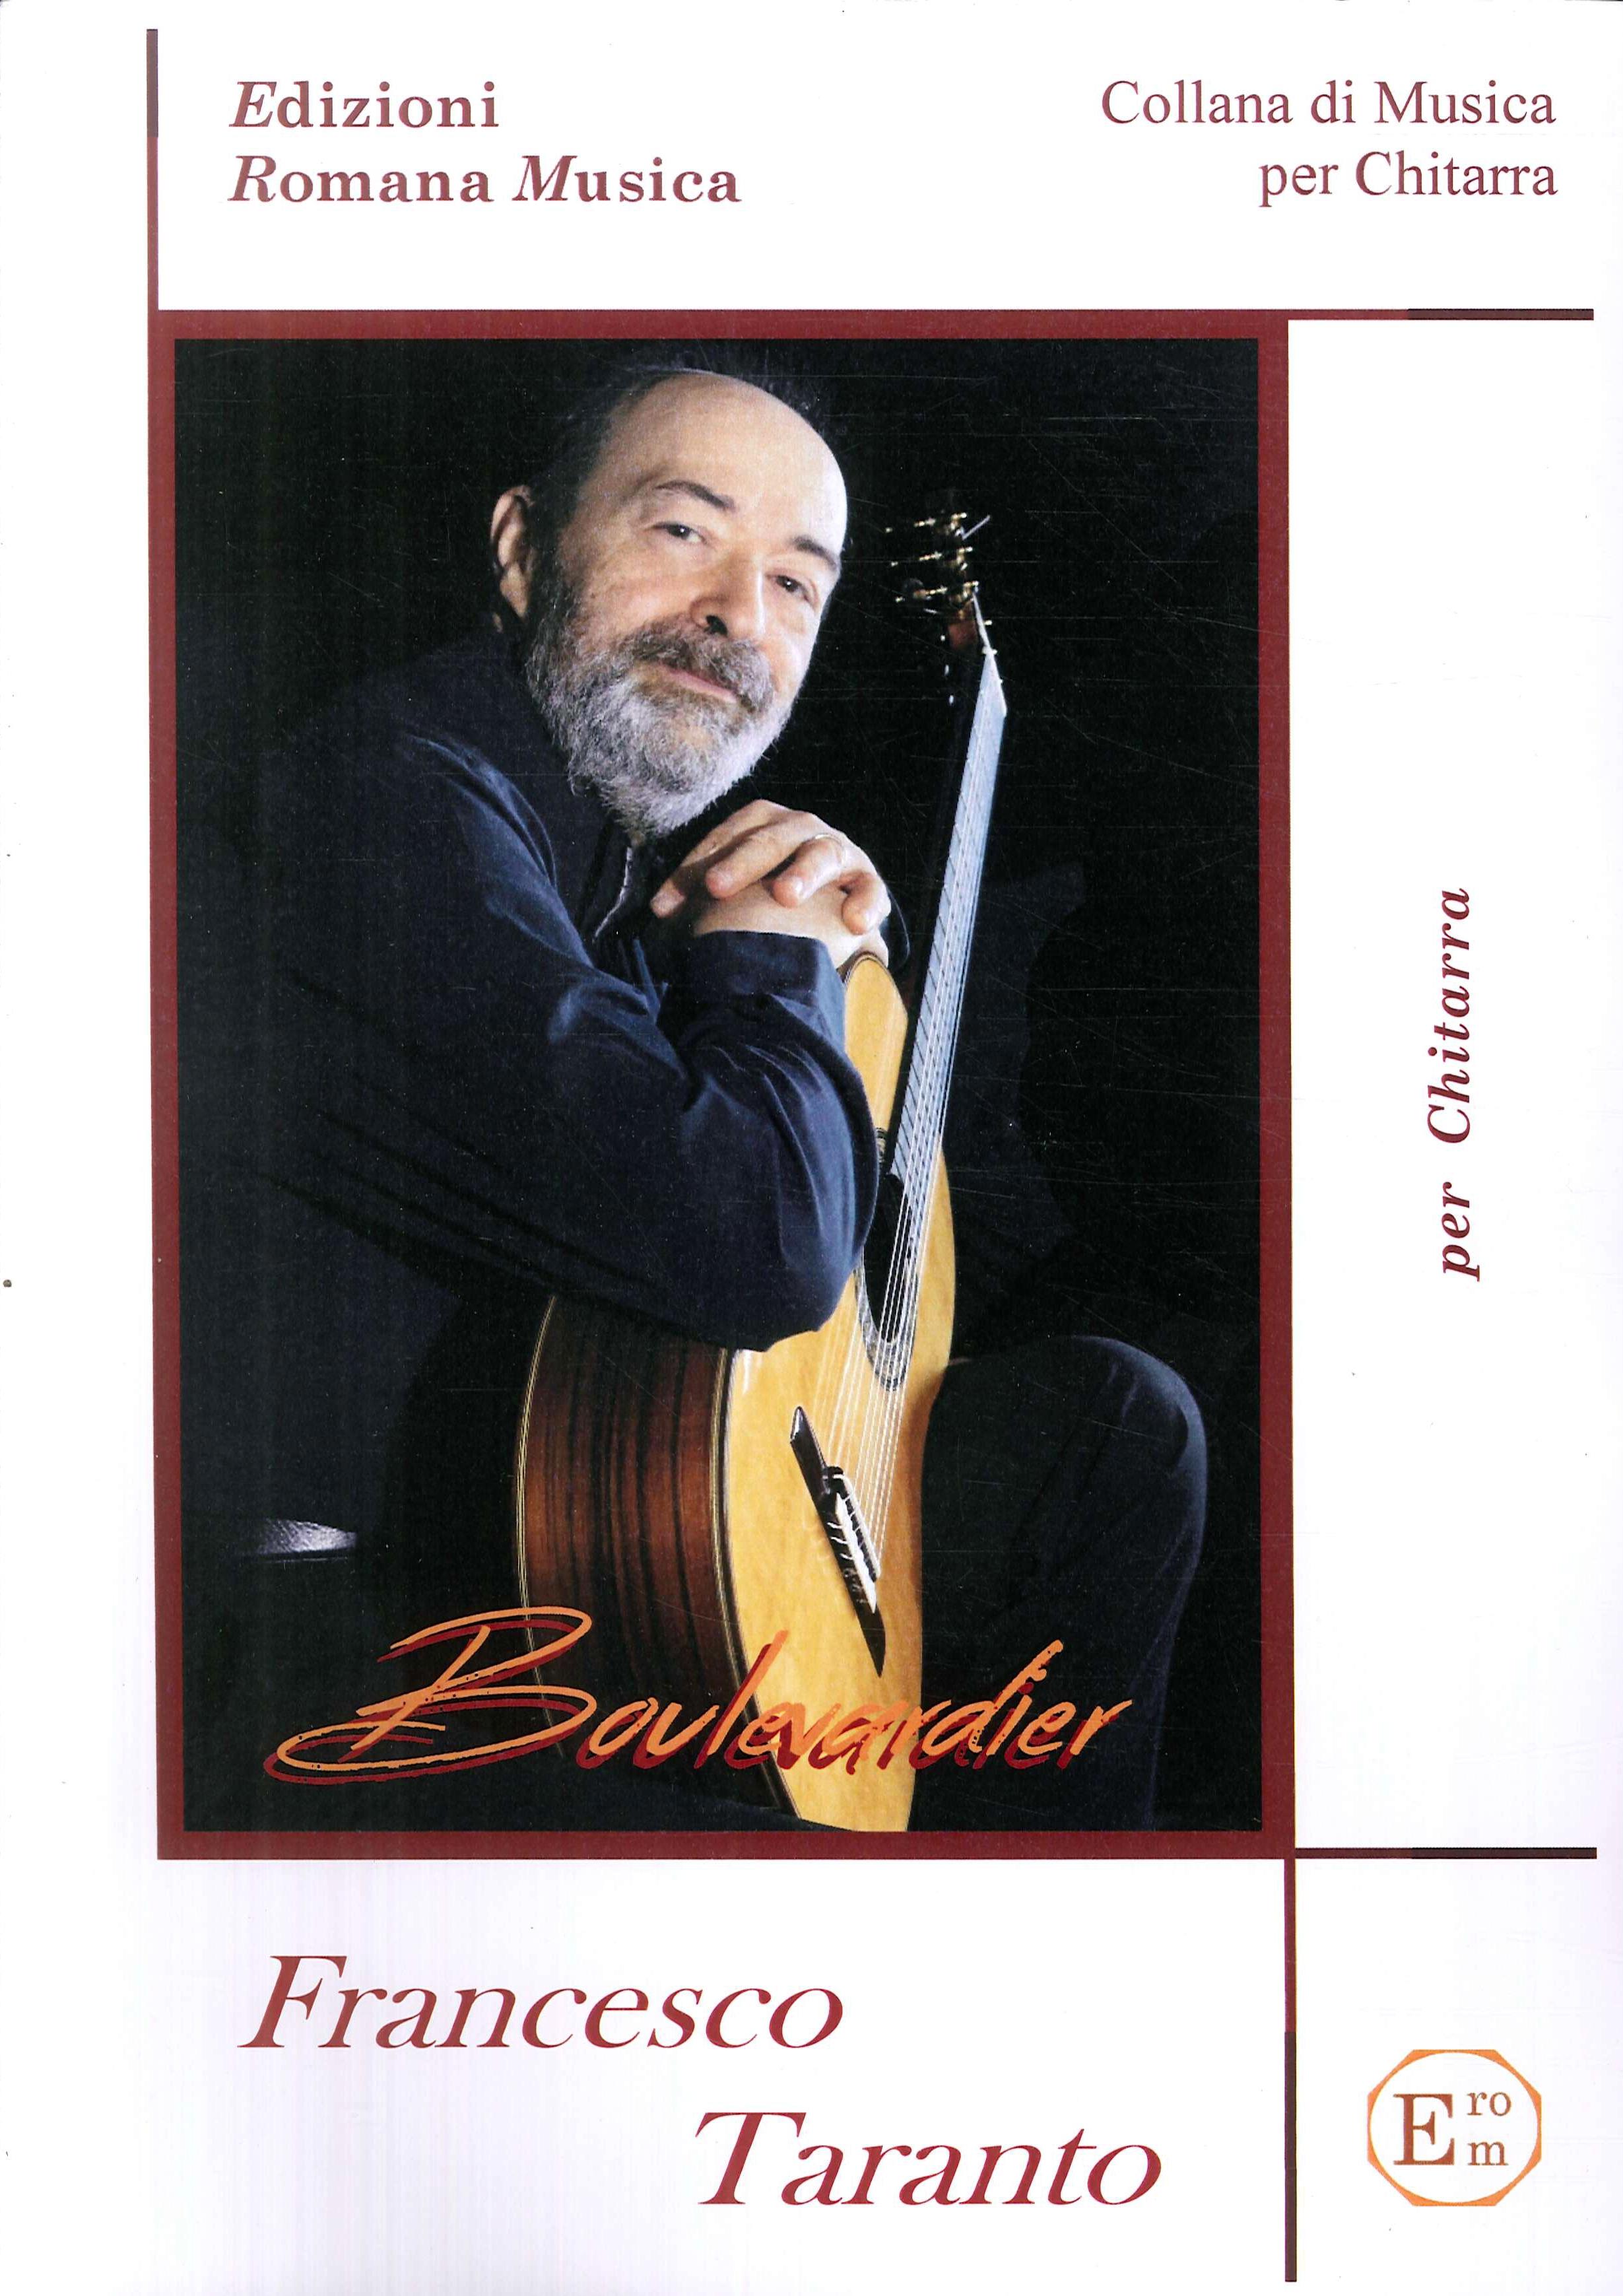 Francesco Taranto. Boulevarier. Musica per Chitarra. Erom 0016